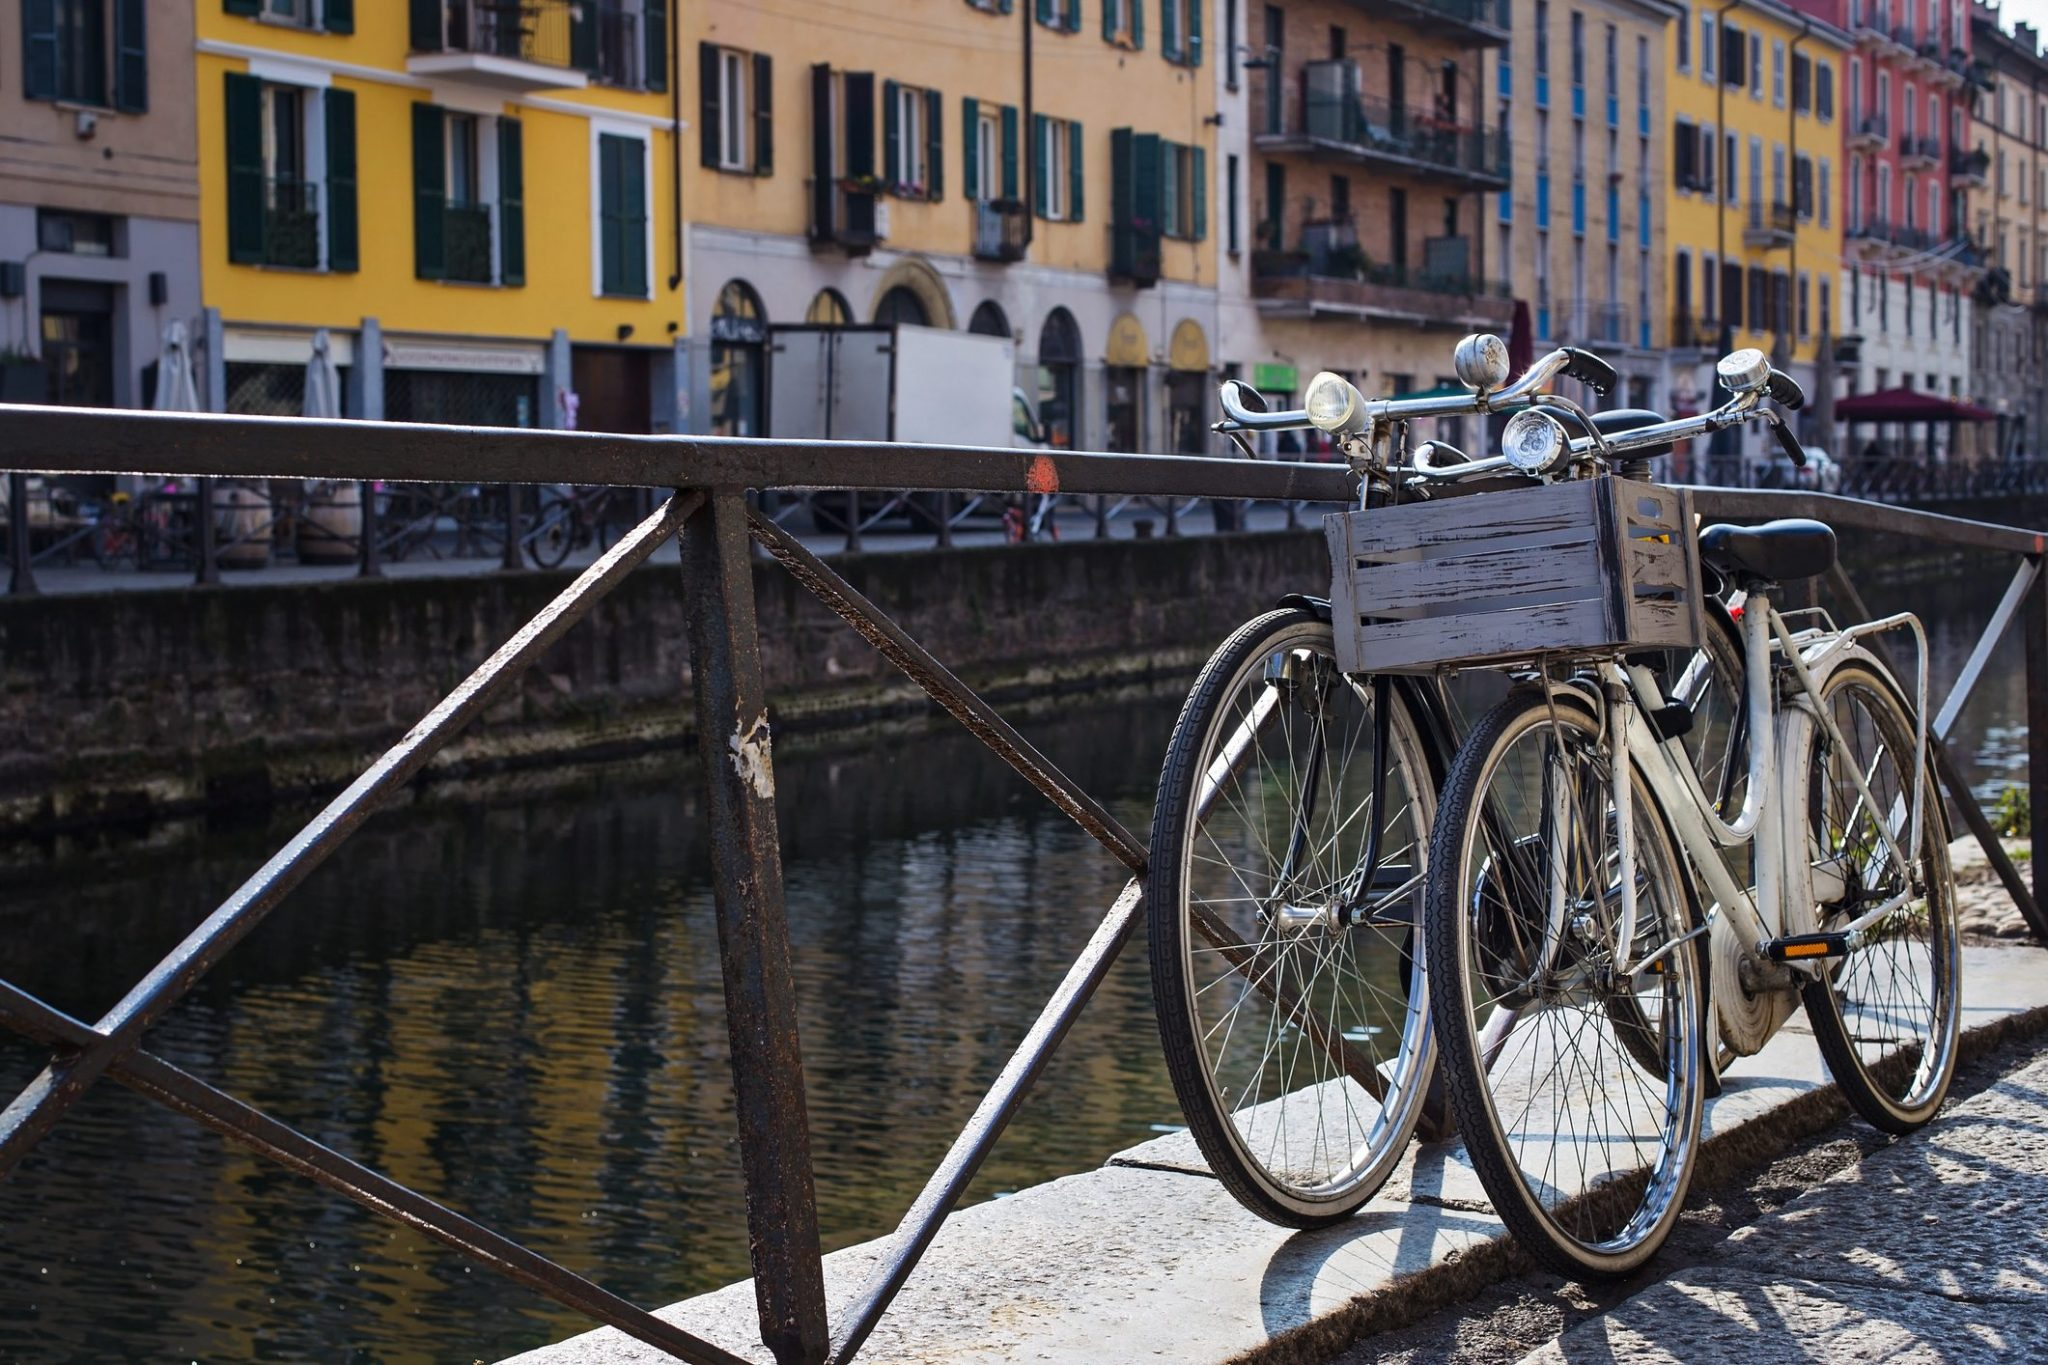 https://www.telepress.news/wp-content/uploads/2021/07/biciclette-sui-navigli-2048x1365-1.jpghttps://www.telepress.news/wp-content/uploads/2021/07/biciclette-sui-navigli-2048x1365-1.jpg